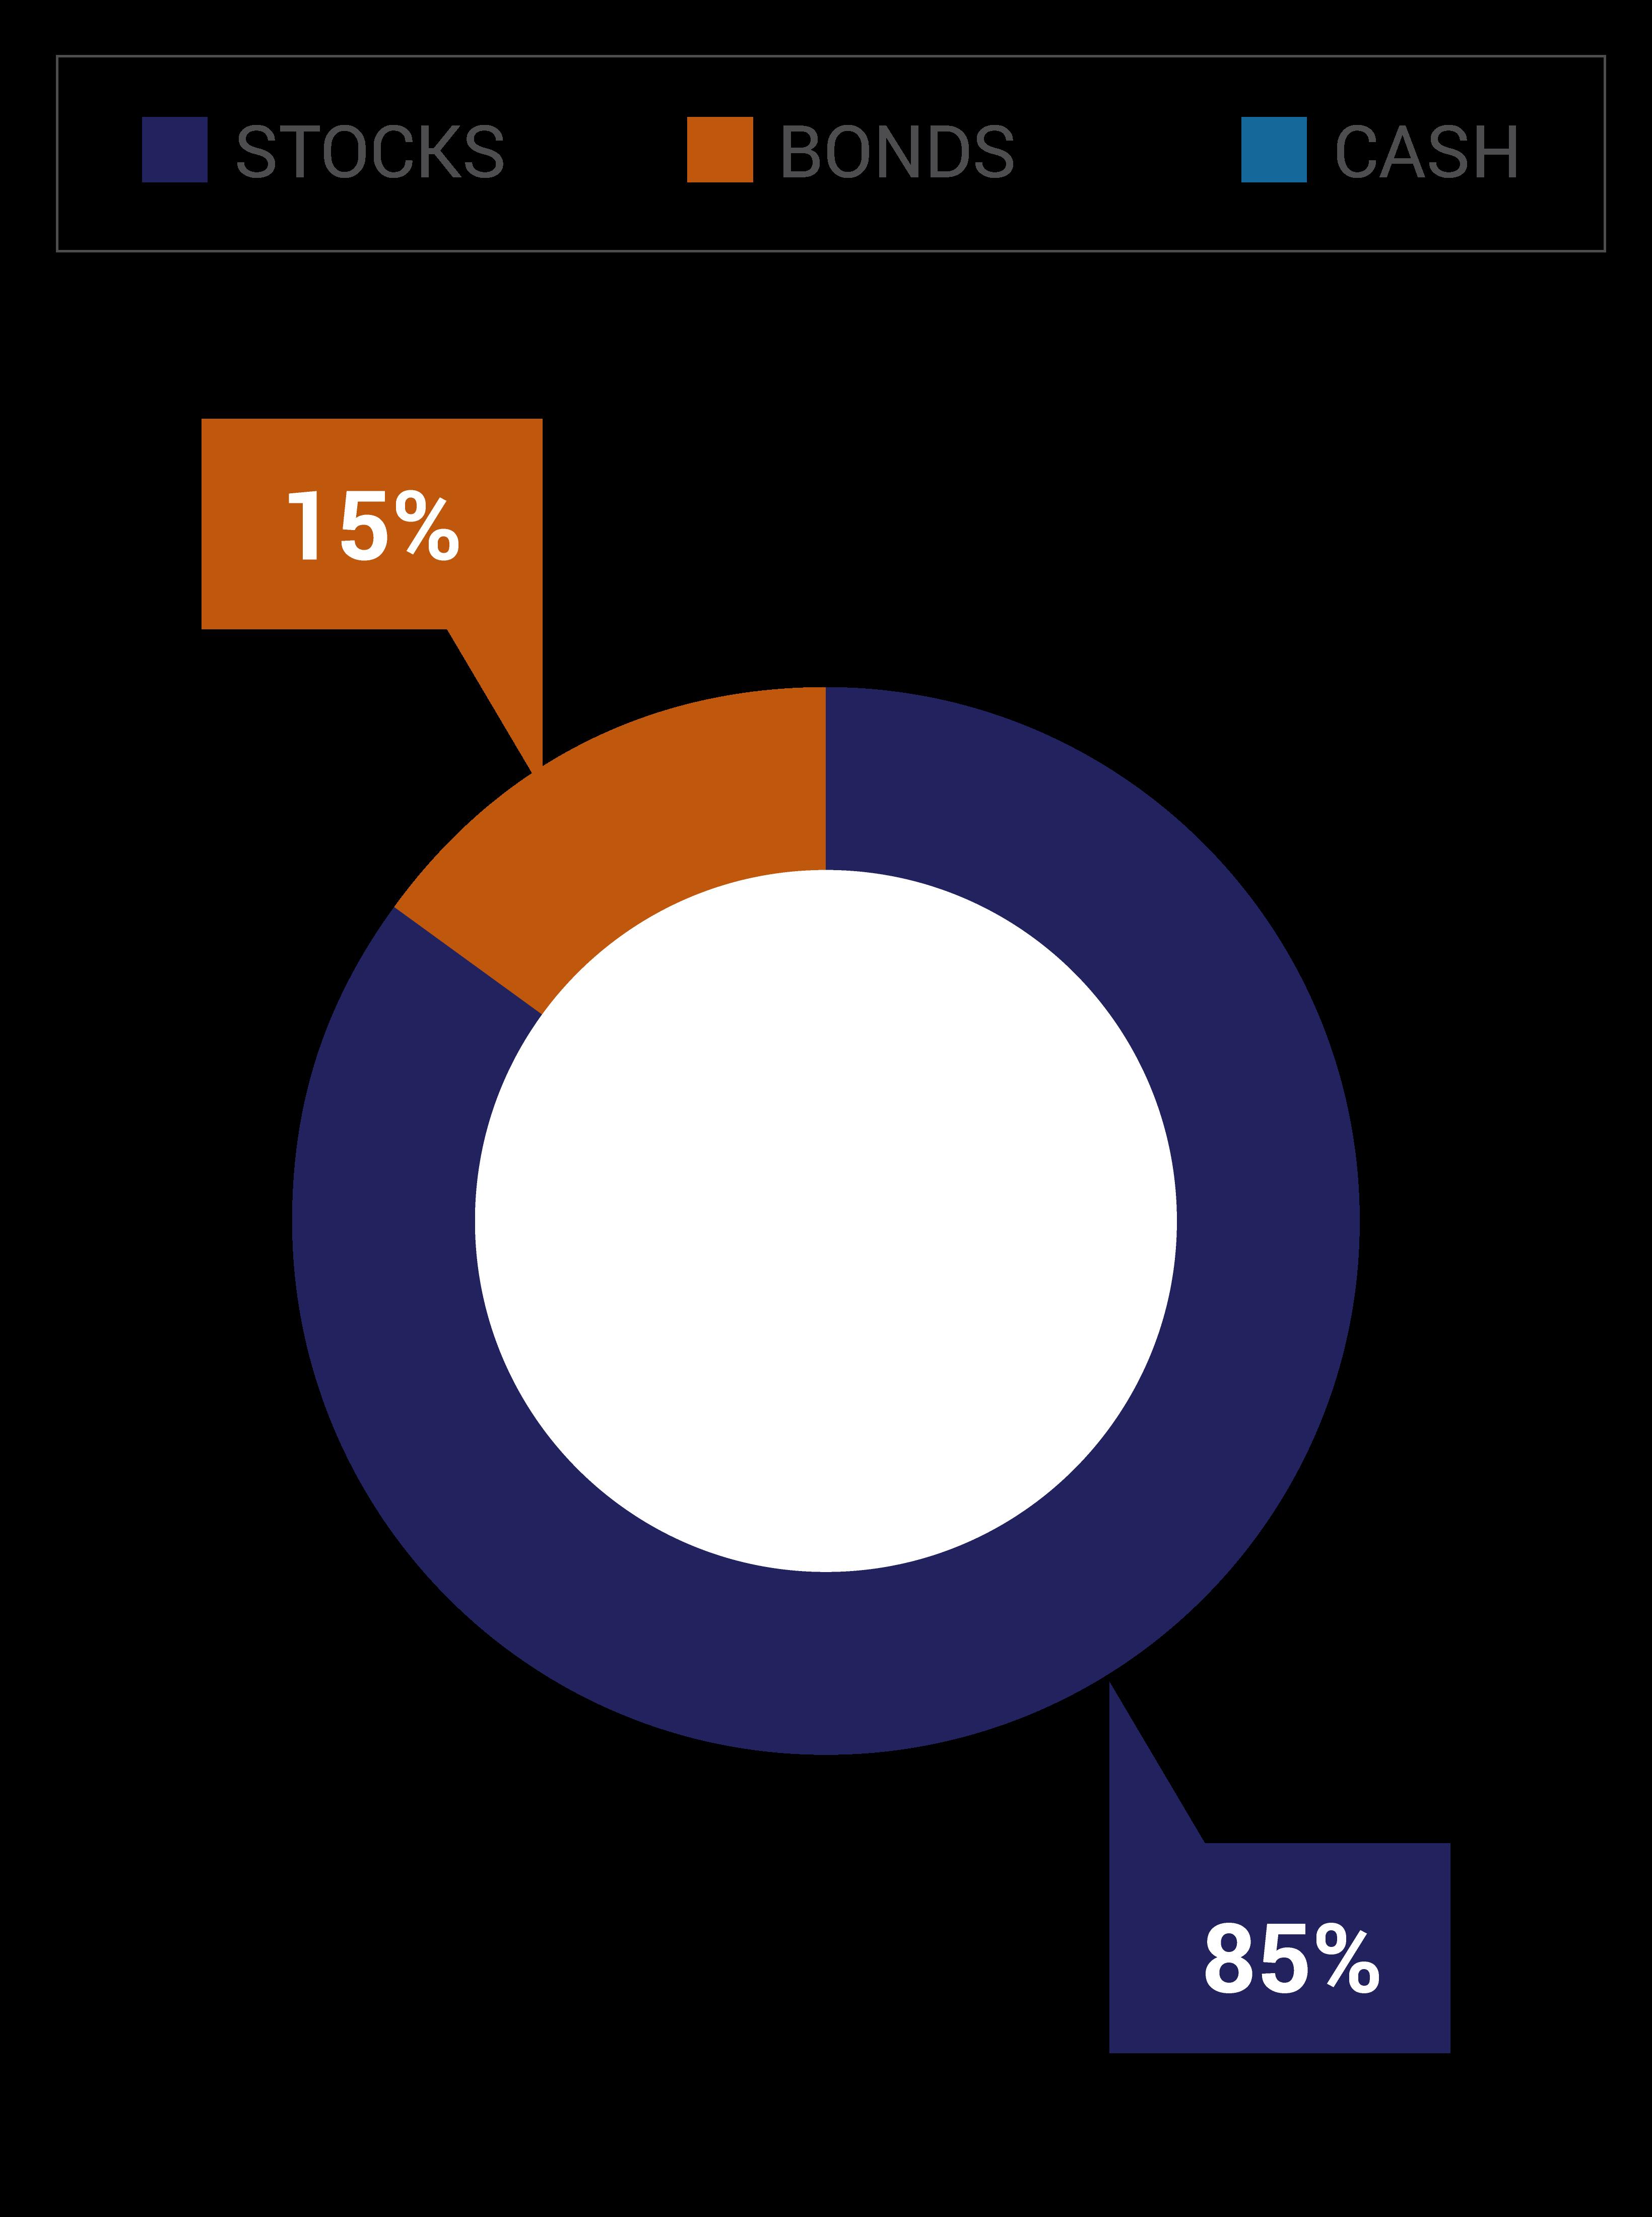 The Aggressive Portfolio Option consists of 85% stocks and 15% bonds.